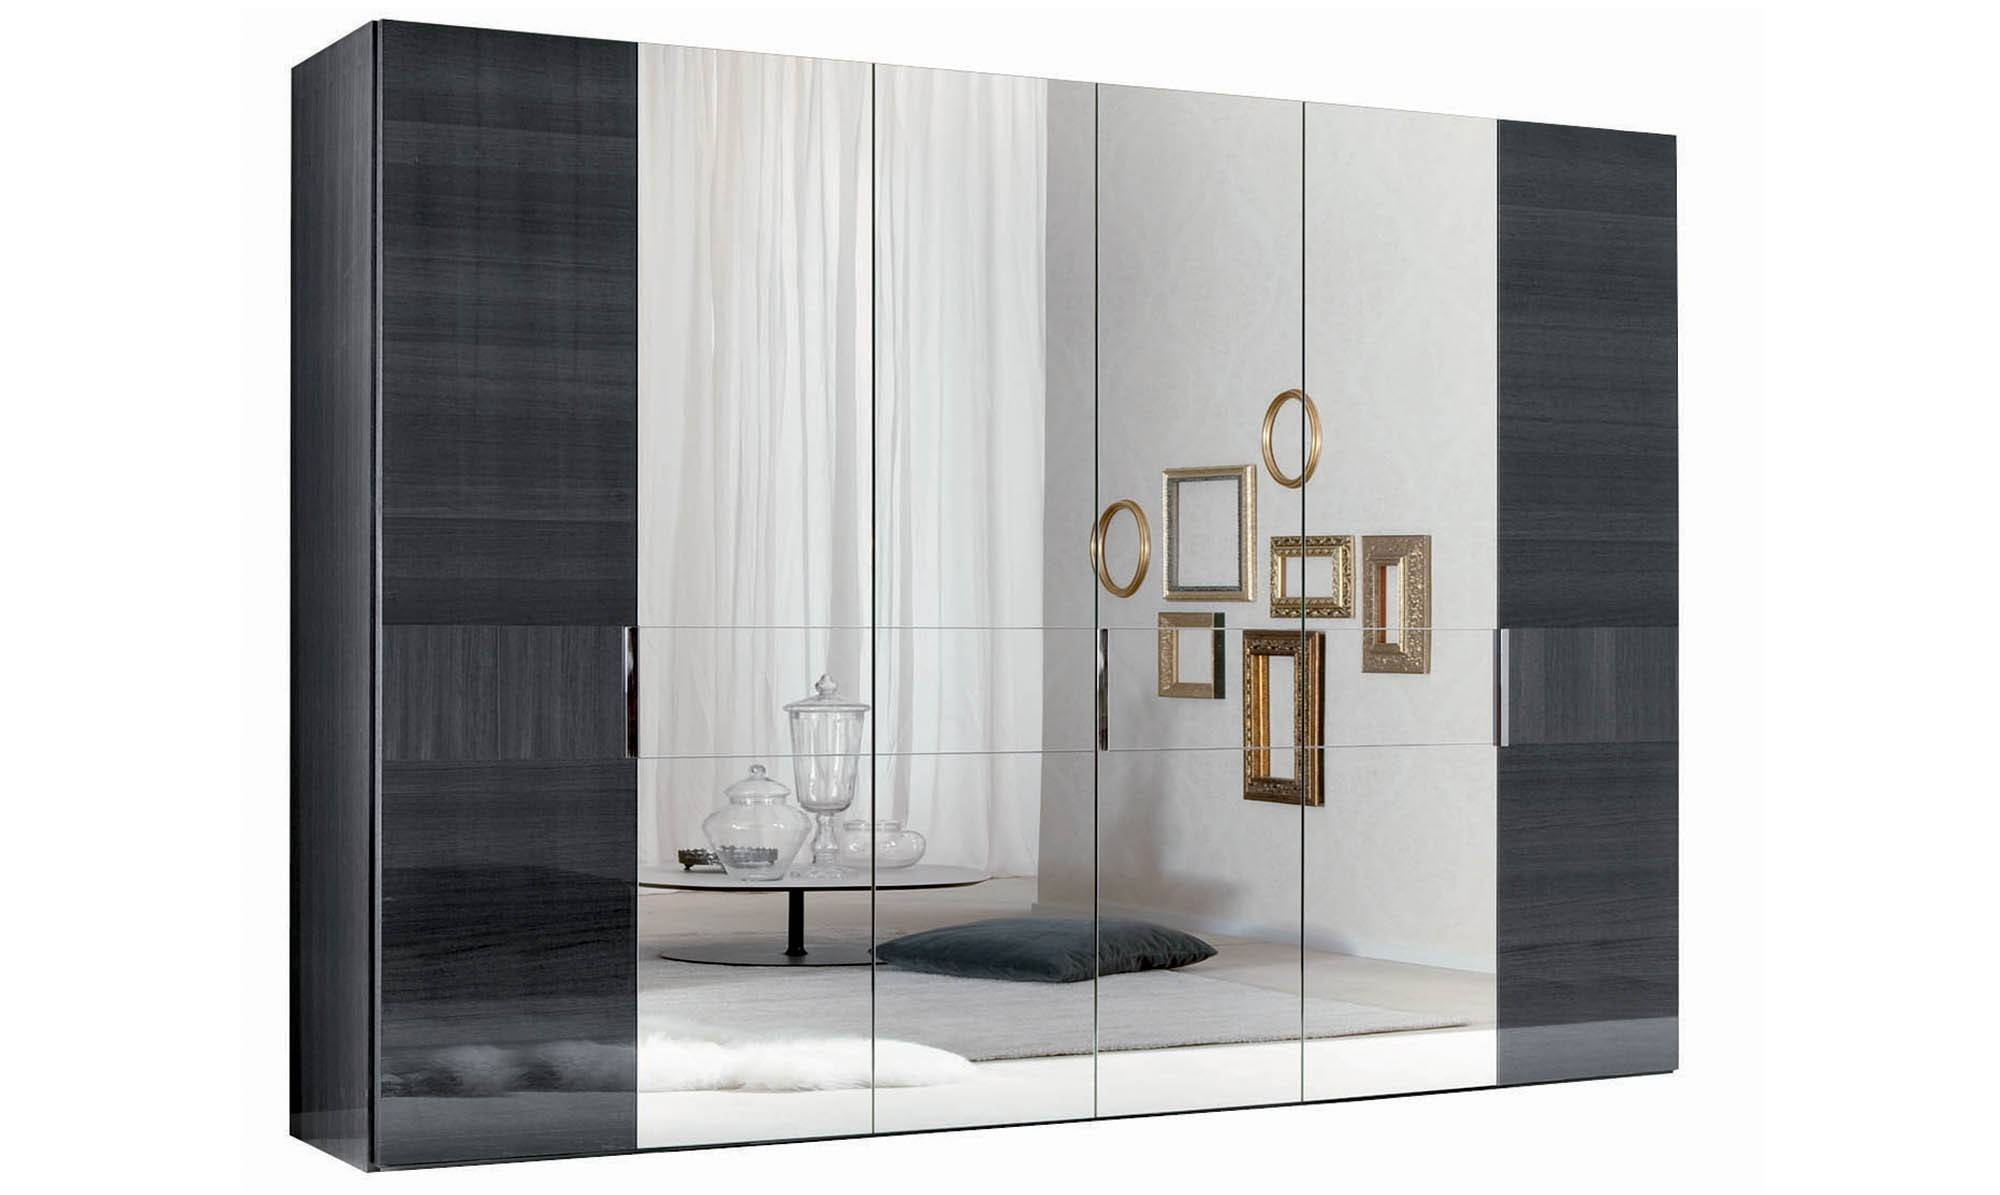 Antibes - 6 Door Hinged Wardrobe 4 Mirror Doors Finish - All pertaining to Wardrobes With 4 Doors (Image 2 of 15)